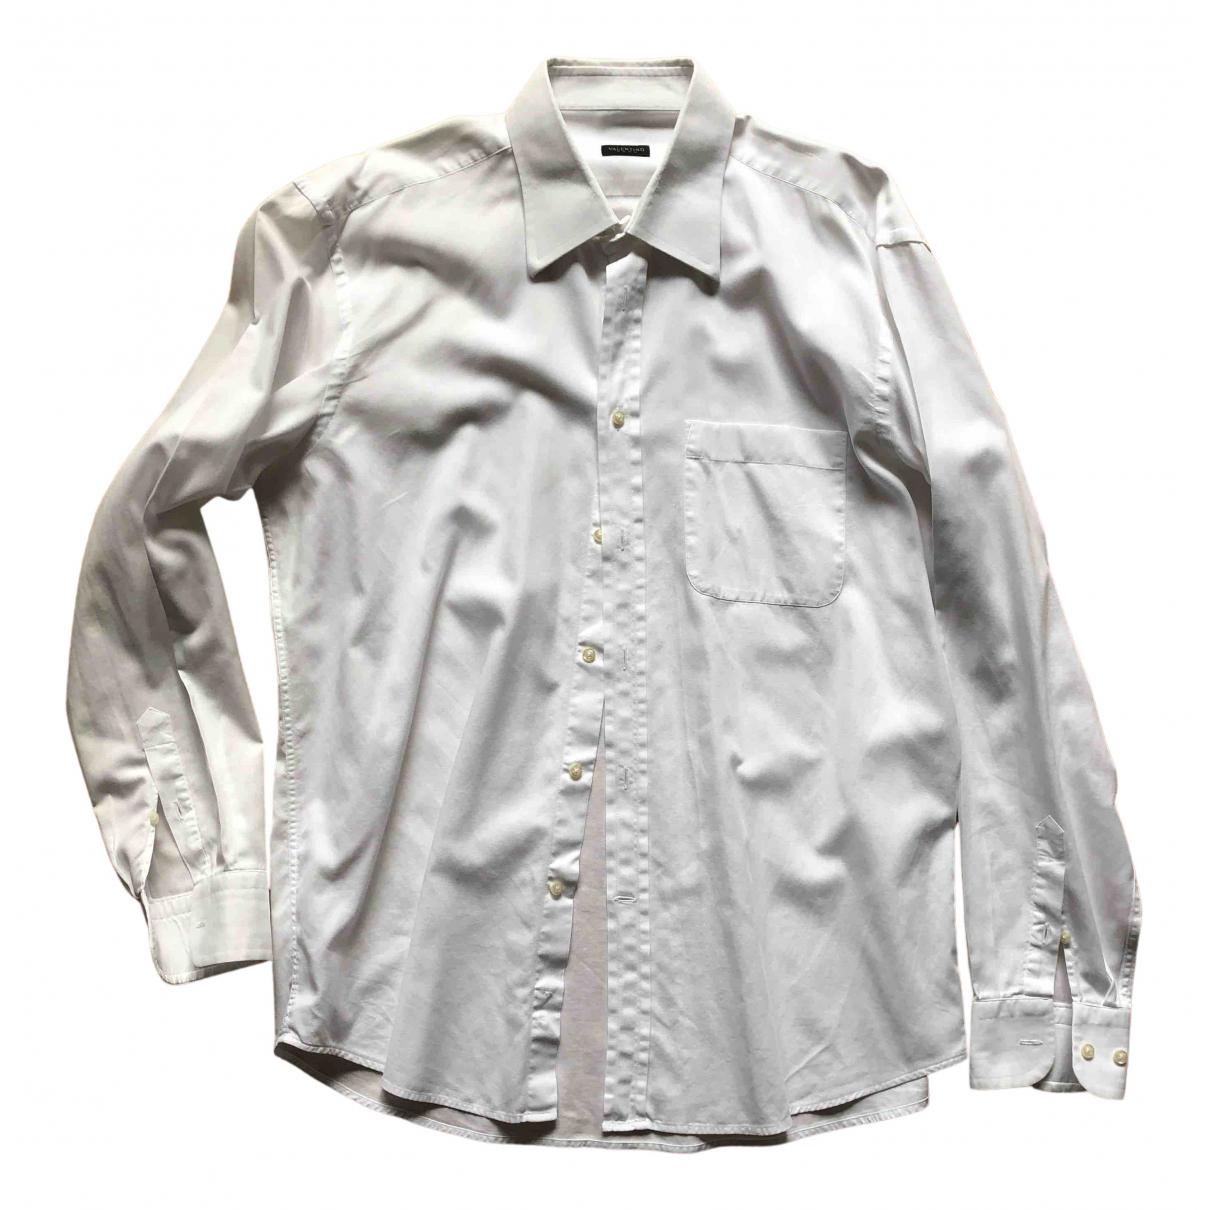 Valentino Garavani N White Cotton Shirts for Men 42 EU (tour de cou / collar)